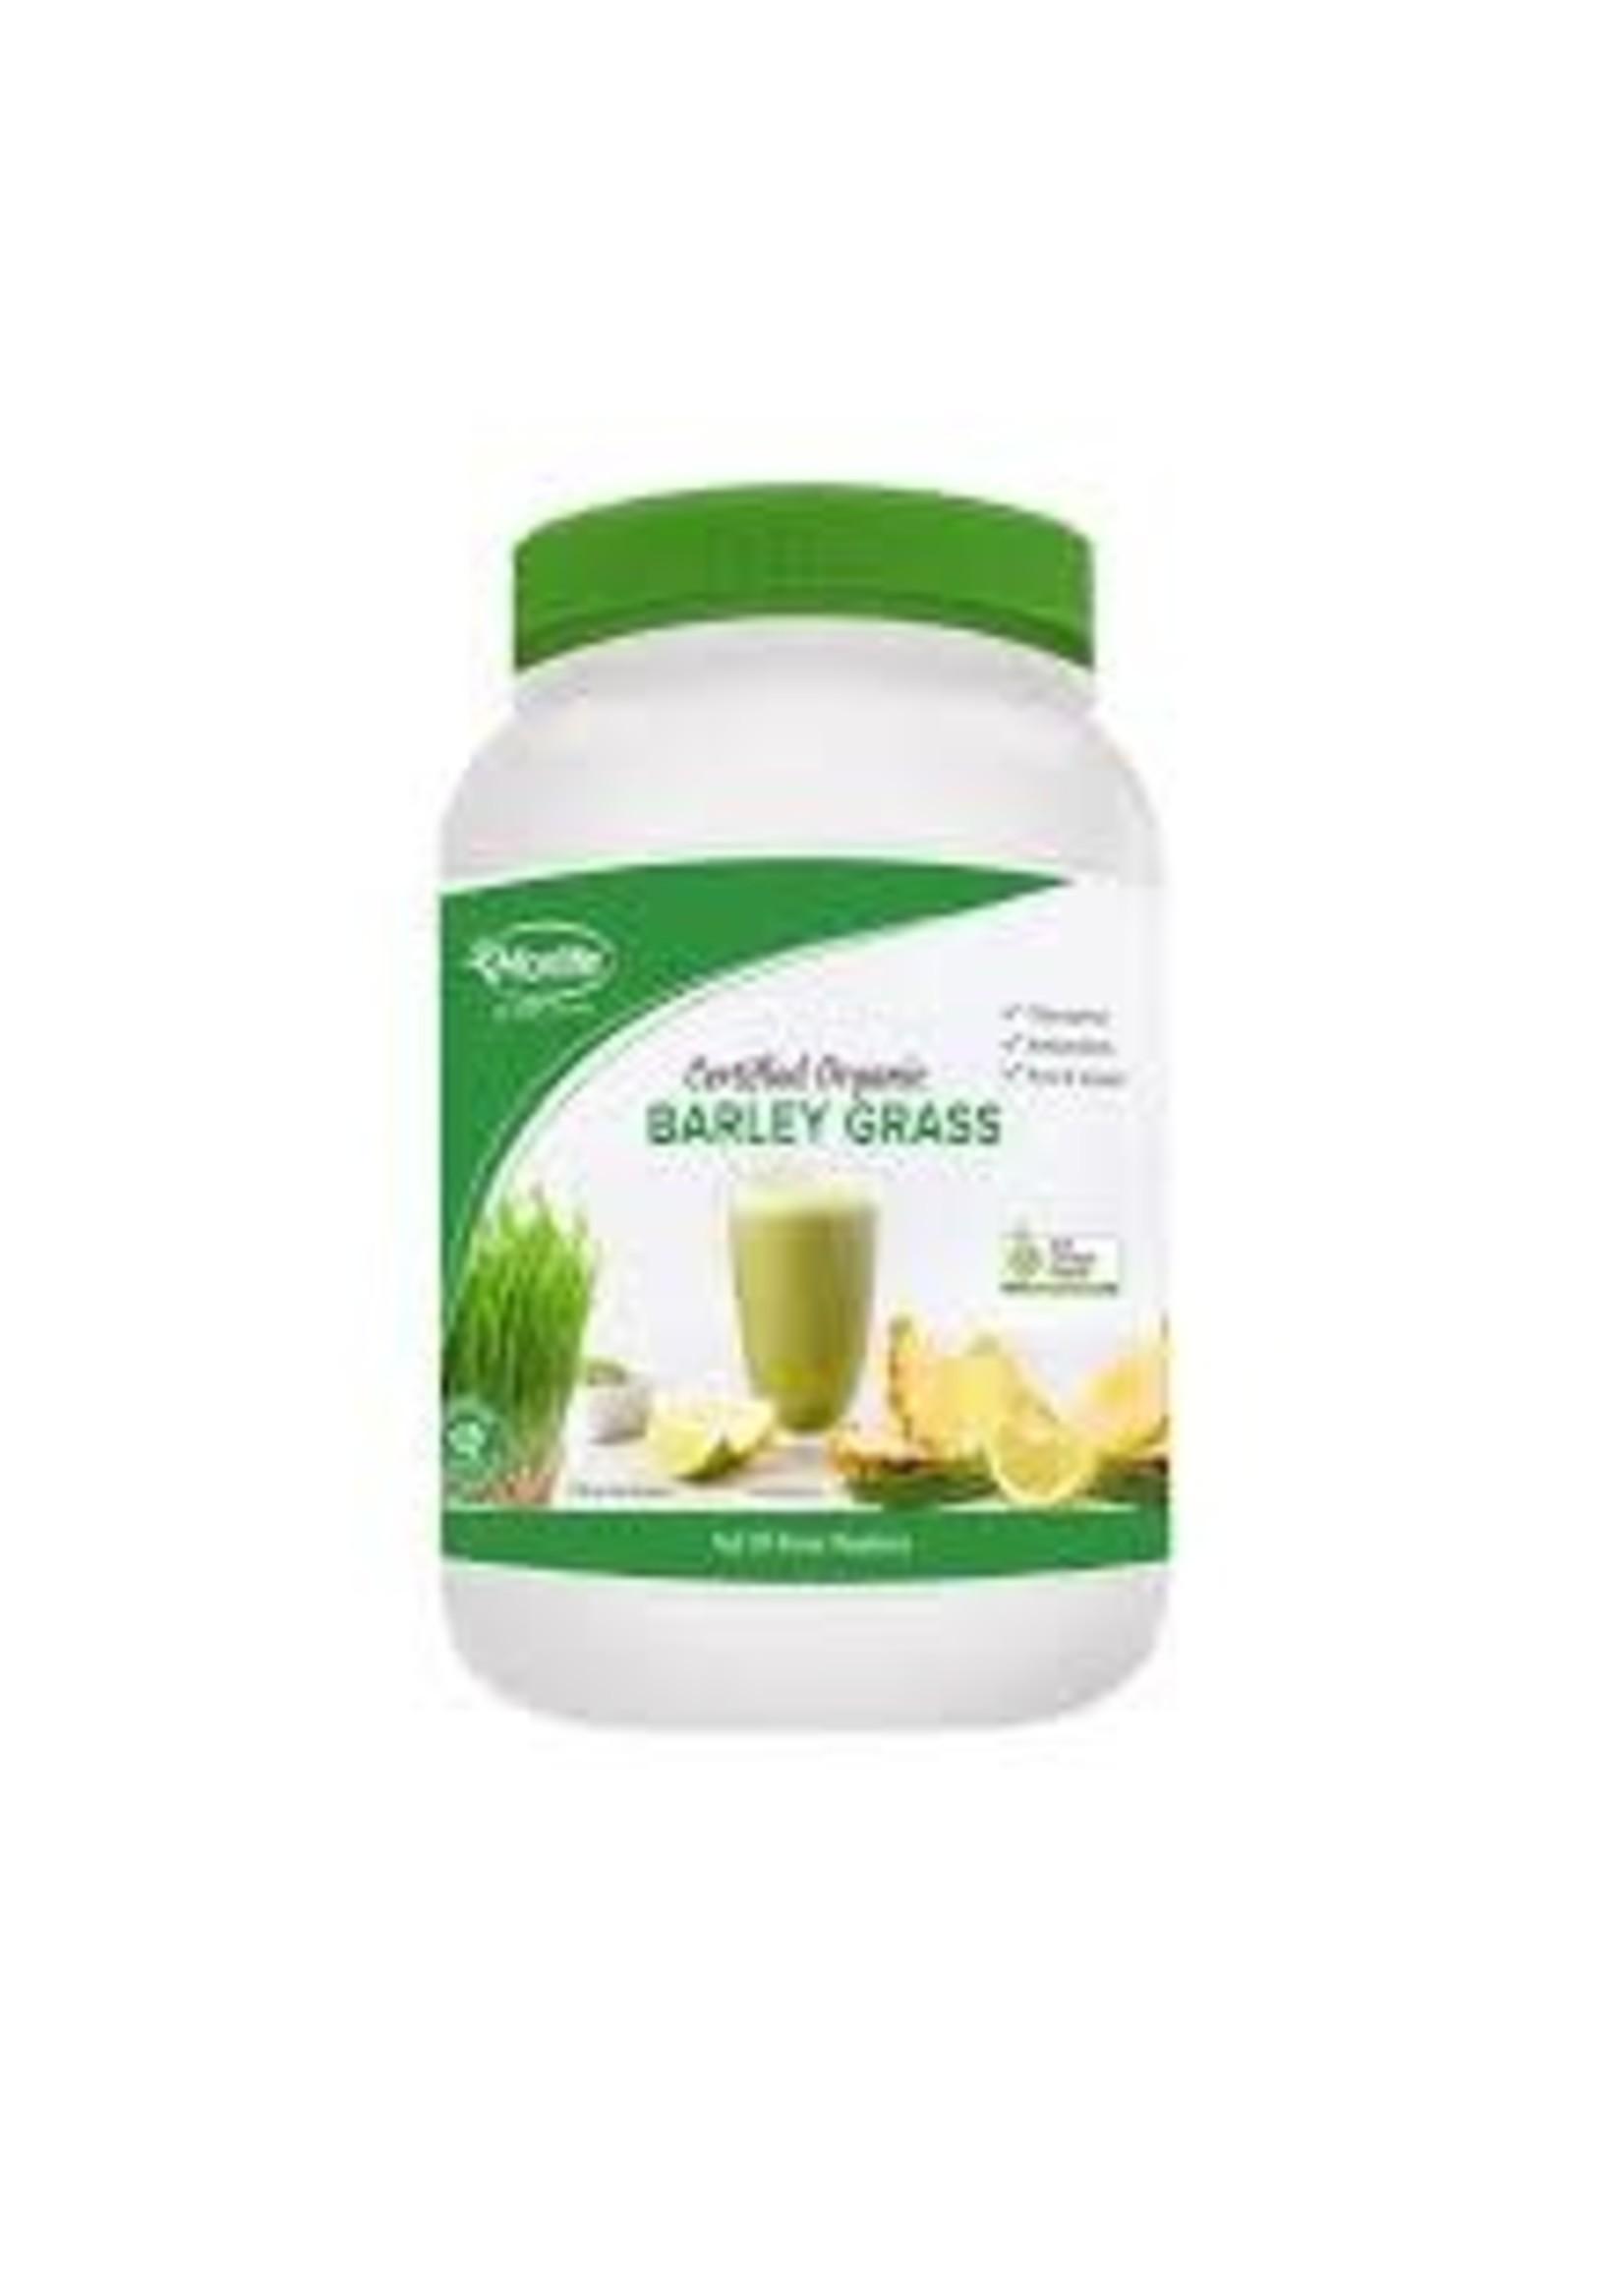 MORLIFE Morlife Barley Grass Powder Cert. Org 1kg jar ACO processor 10620